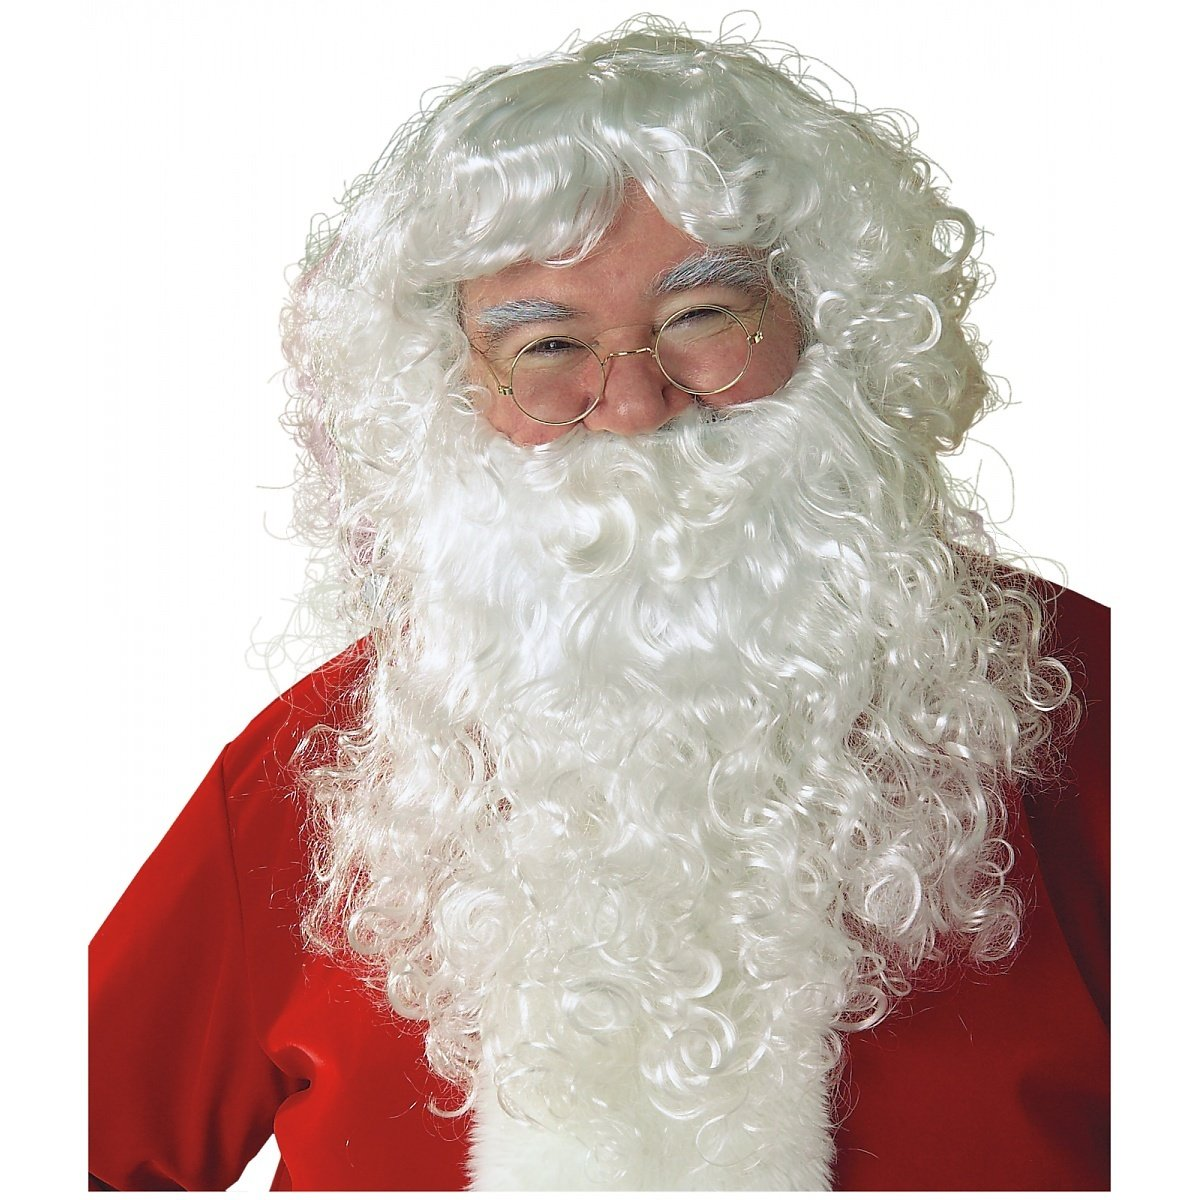 Economy Santa Beard & Wig Set Adult Santa Wig and Beard - ST Rubies Costume Co RB-2269